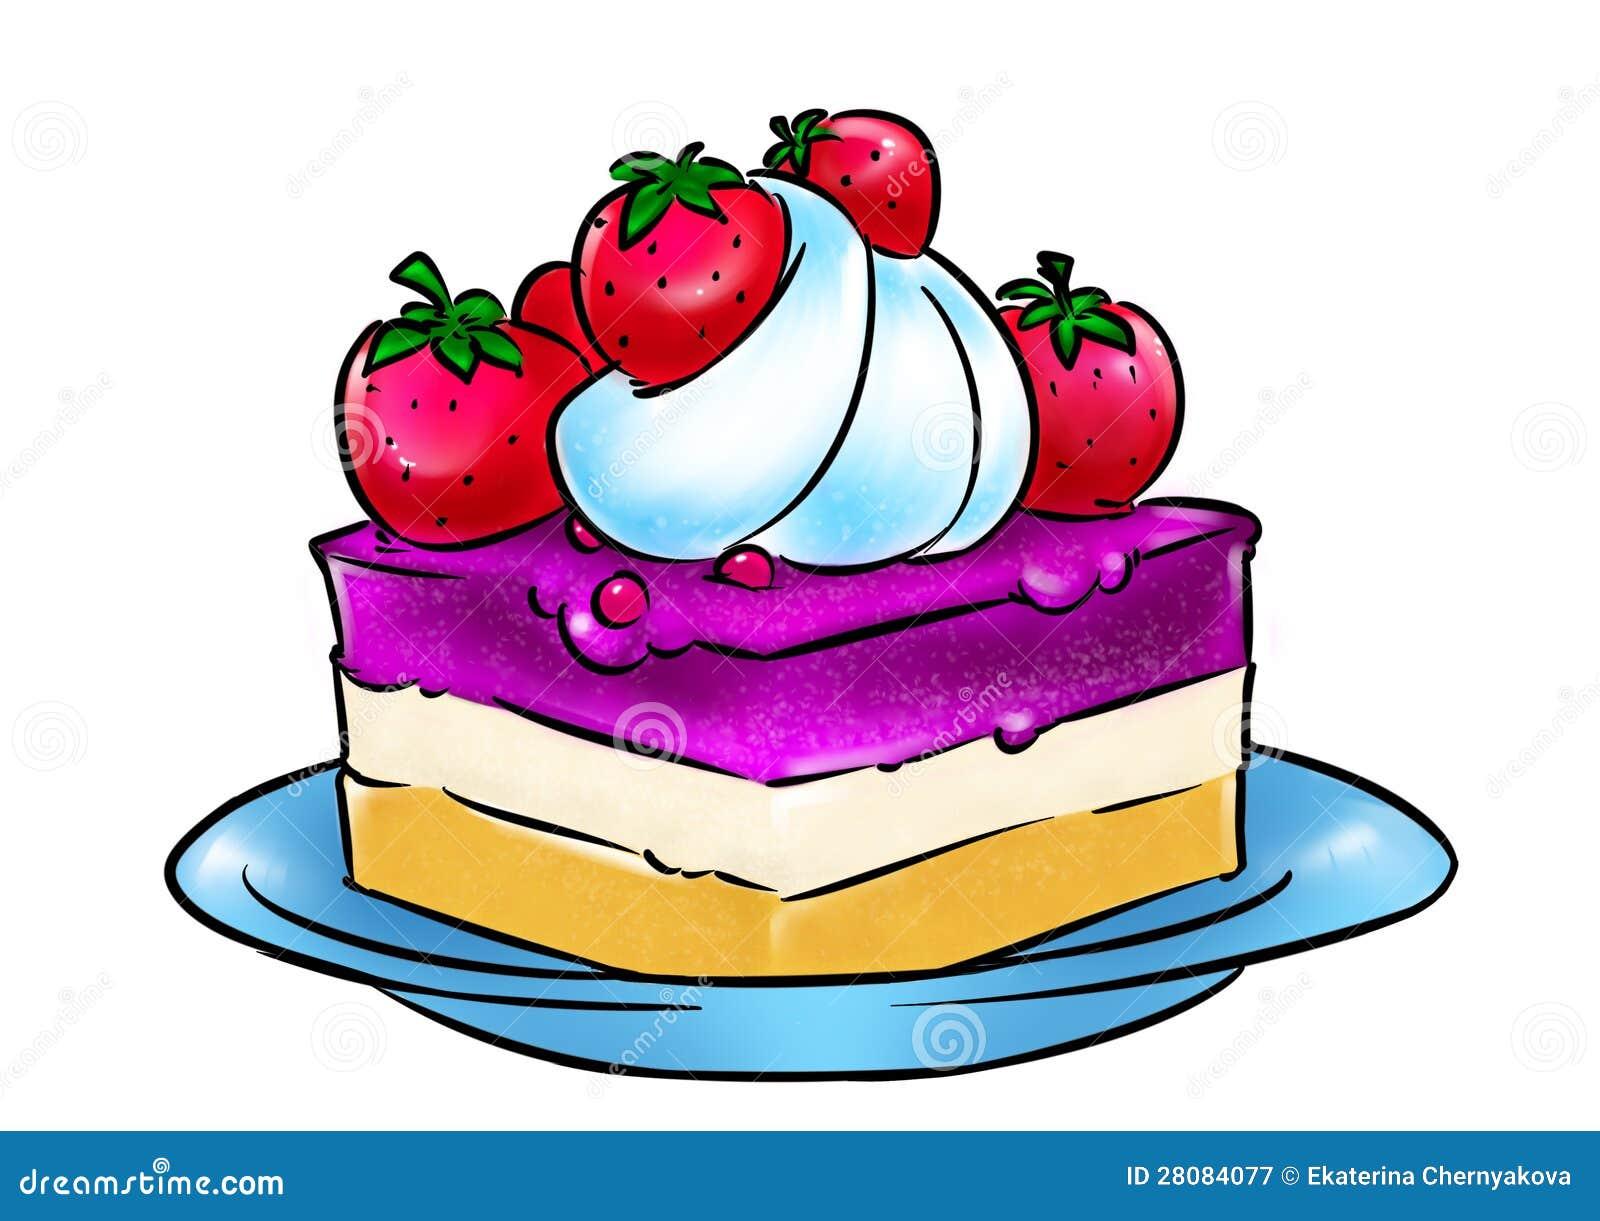 Strawberry Cream Cake Illustration Royalty Free Stock ...